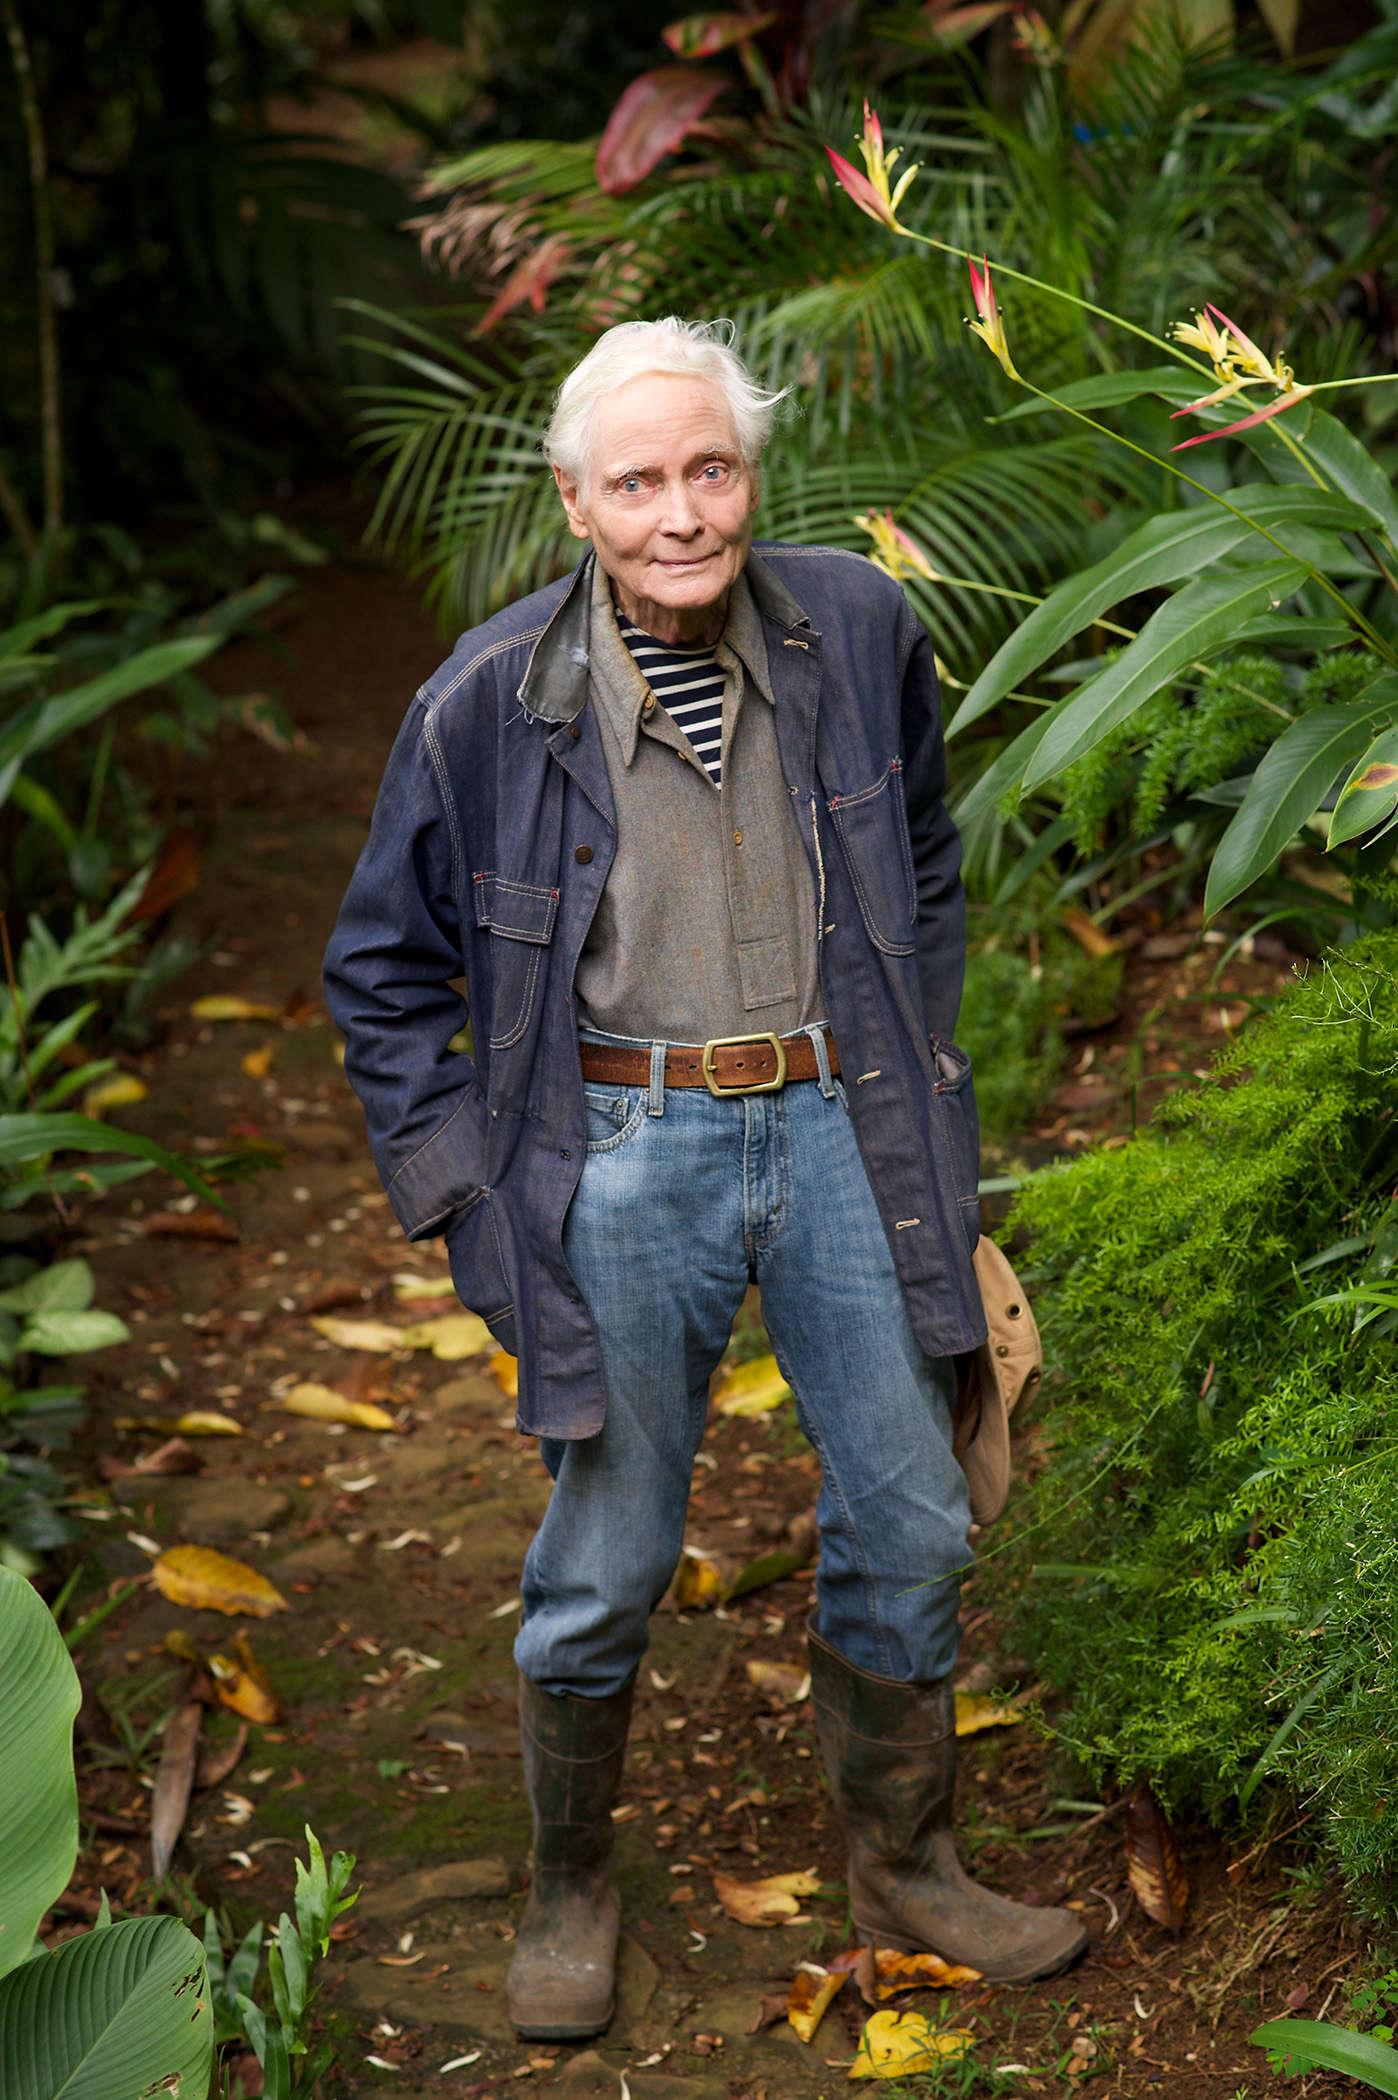 w-s-merwin-what-is-a-garden-book-author-portraitl